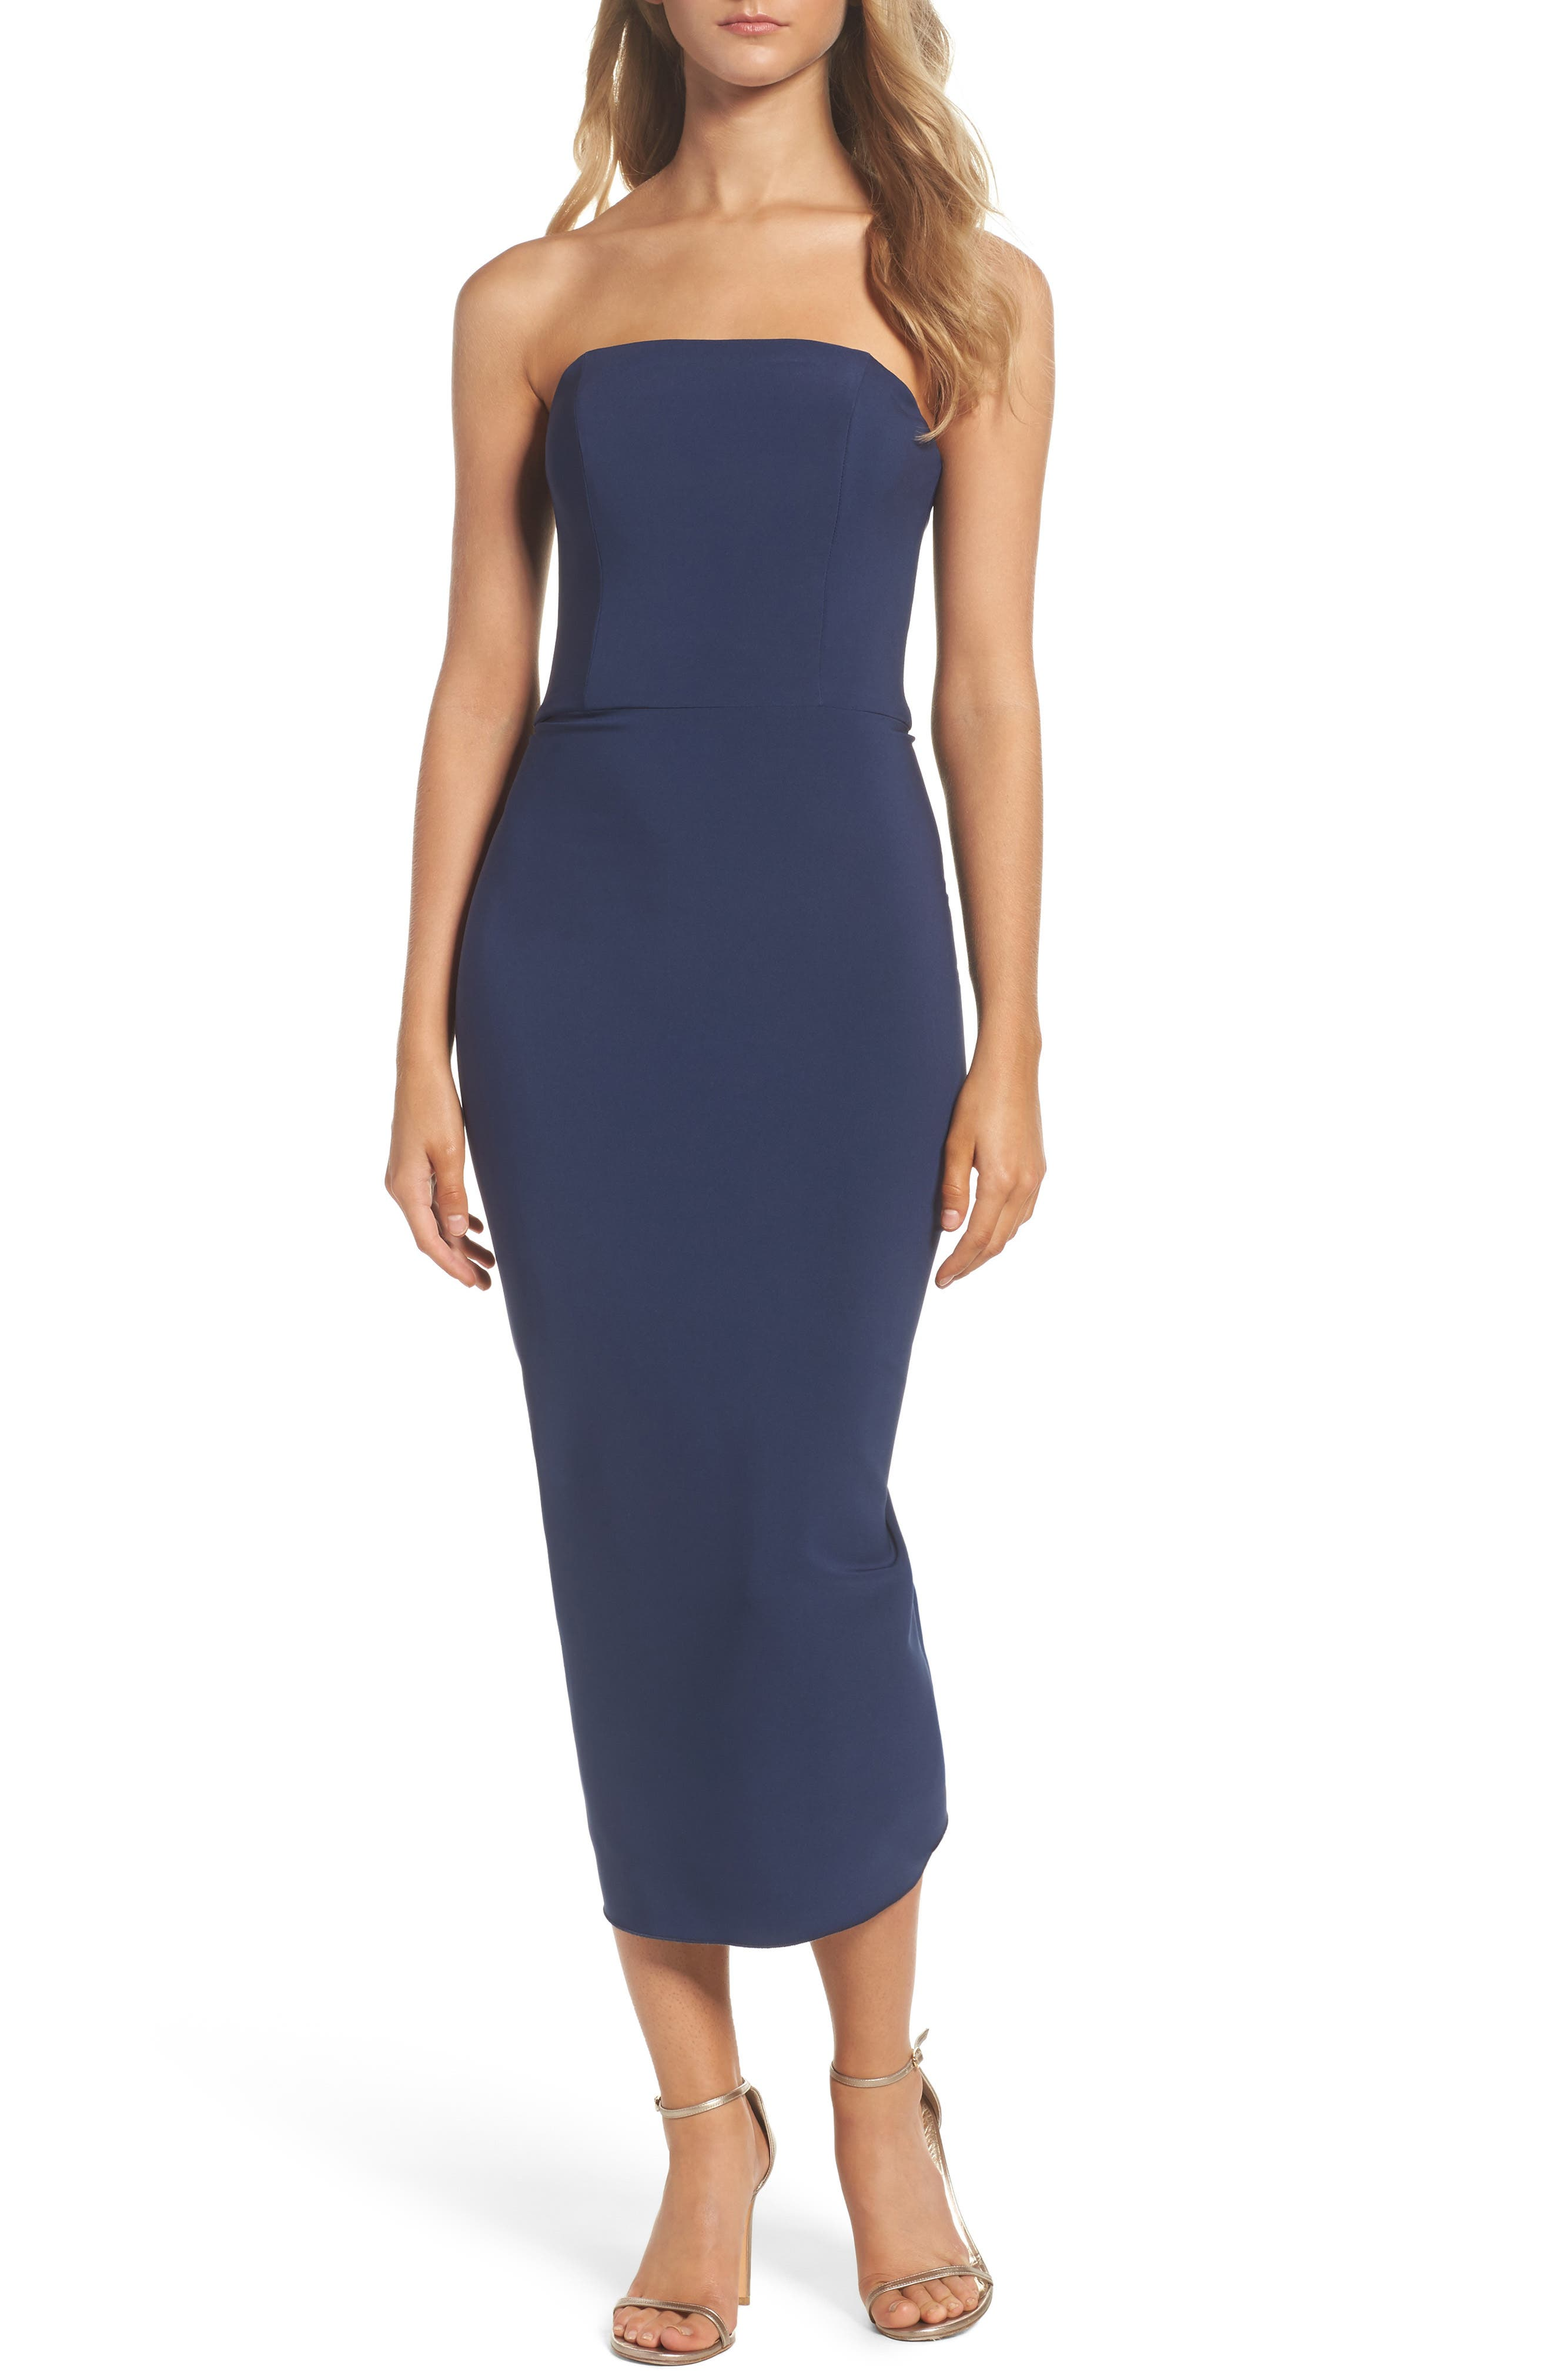 Alternate Image 1 Selected - Maria Bianca Nero Strapless Ruffle Dress